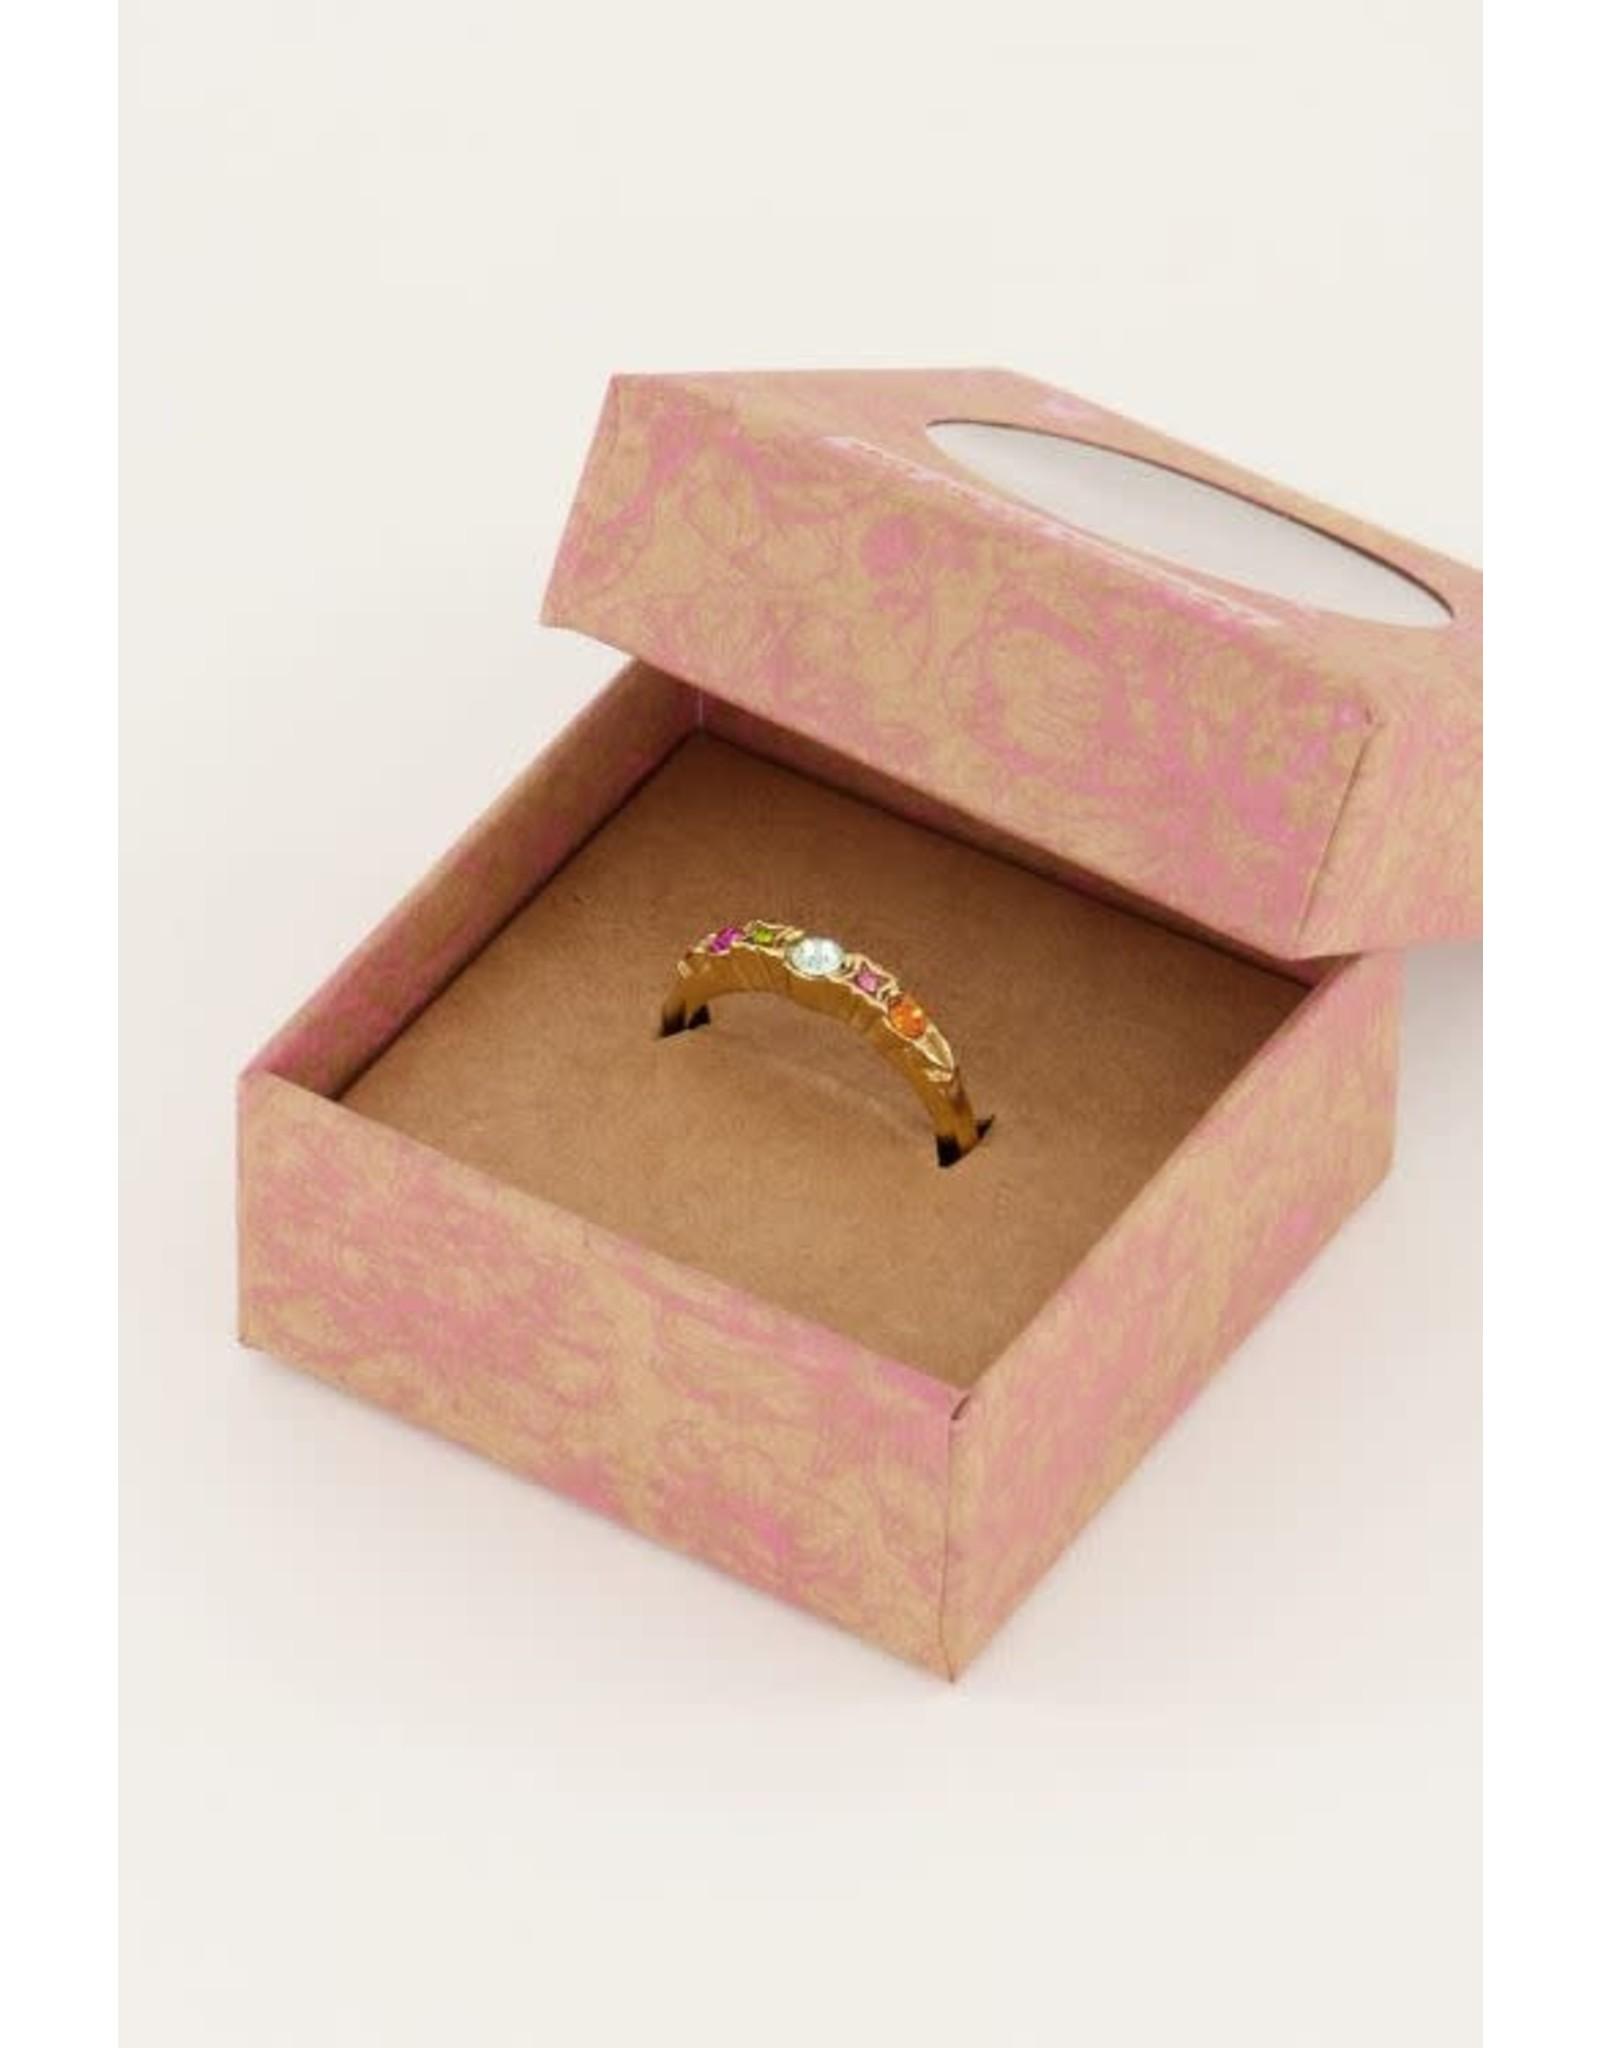 My Jewellery My Jewellery vintage ring multikleur